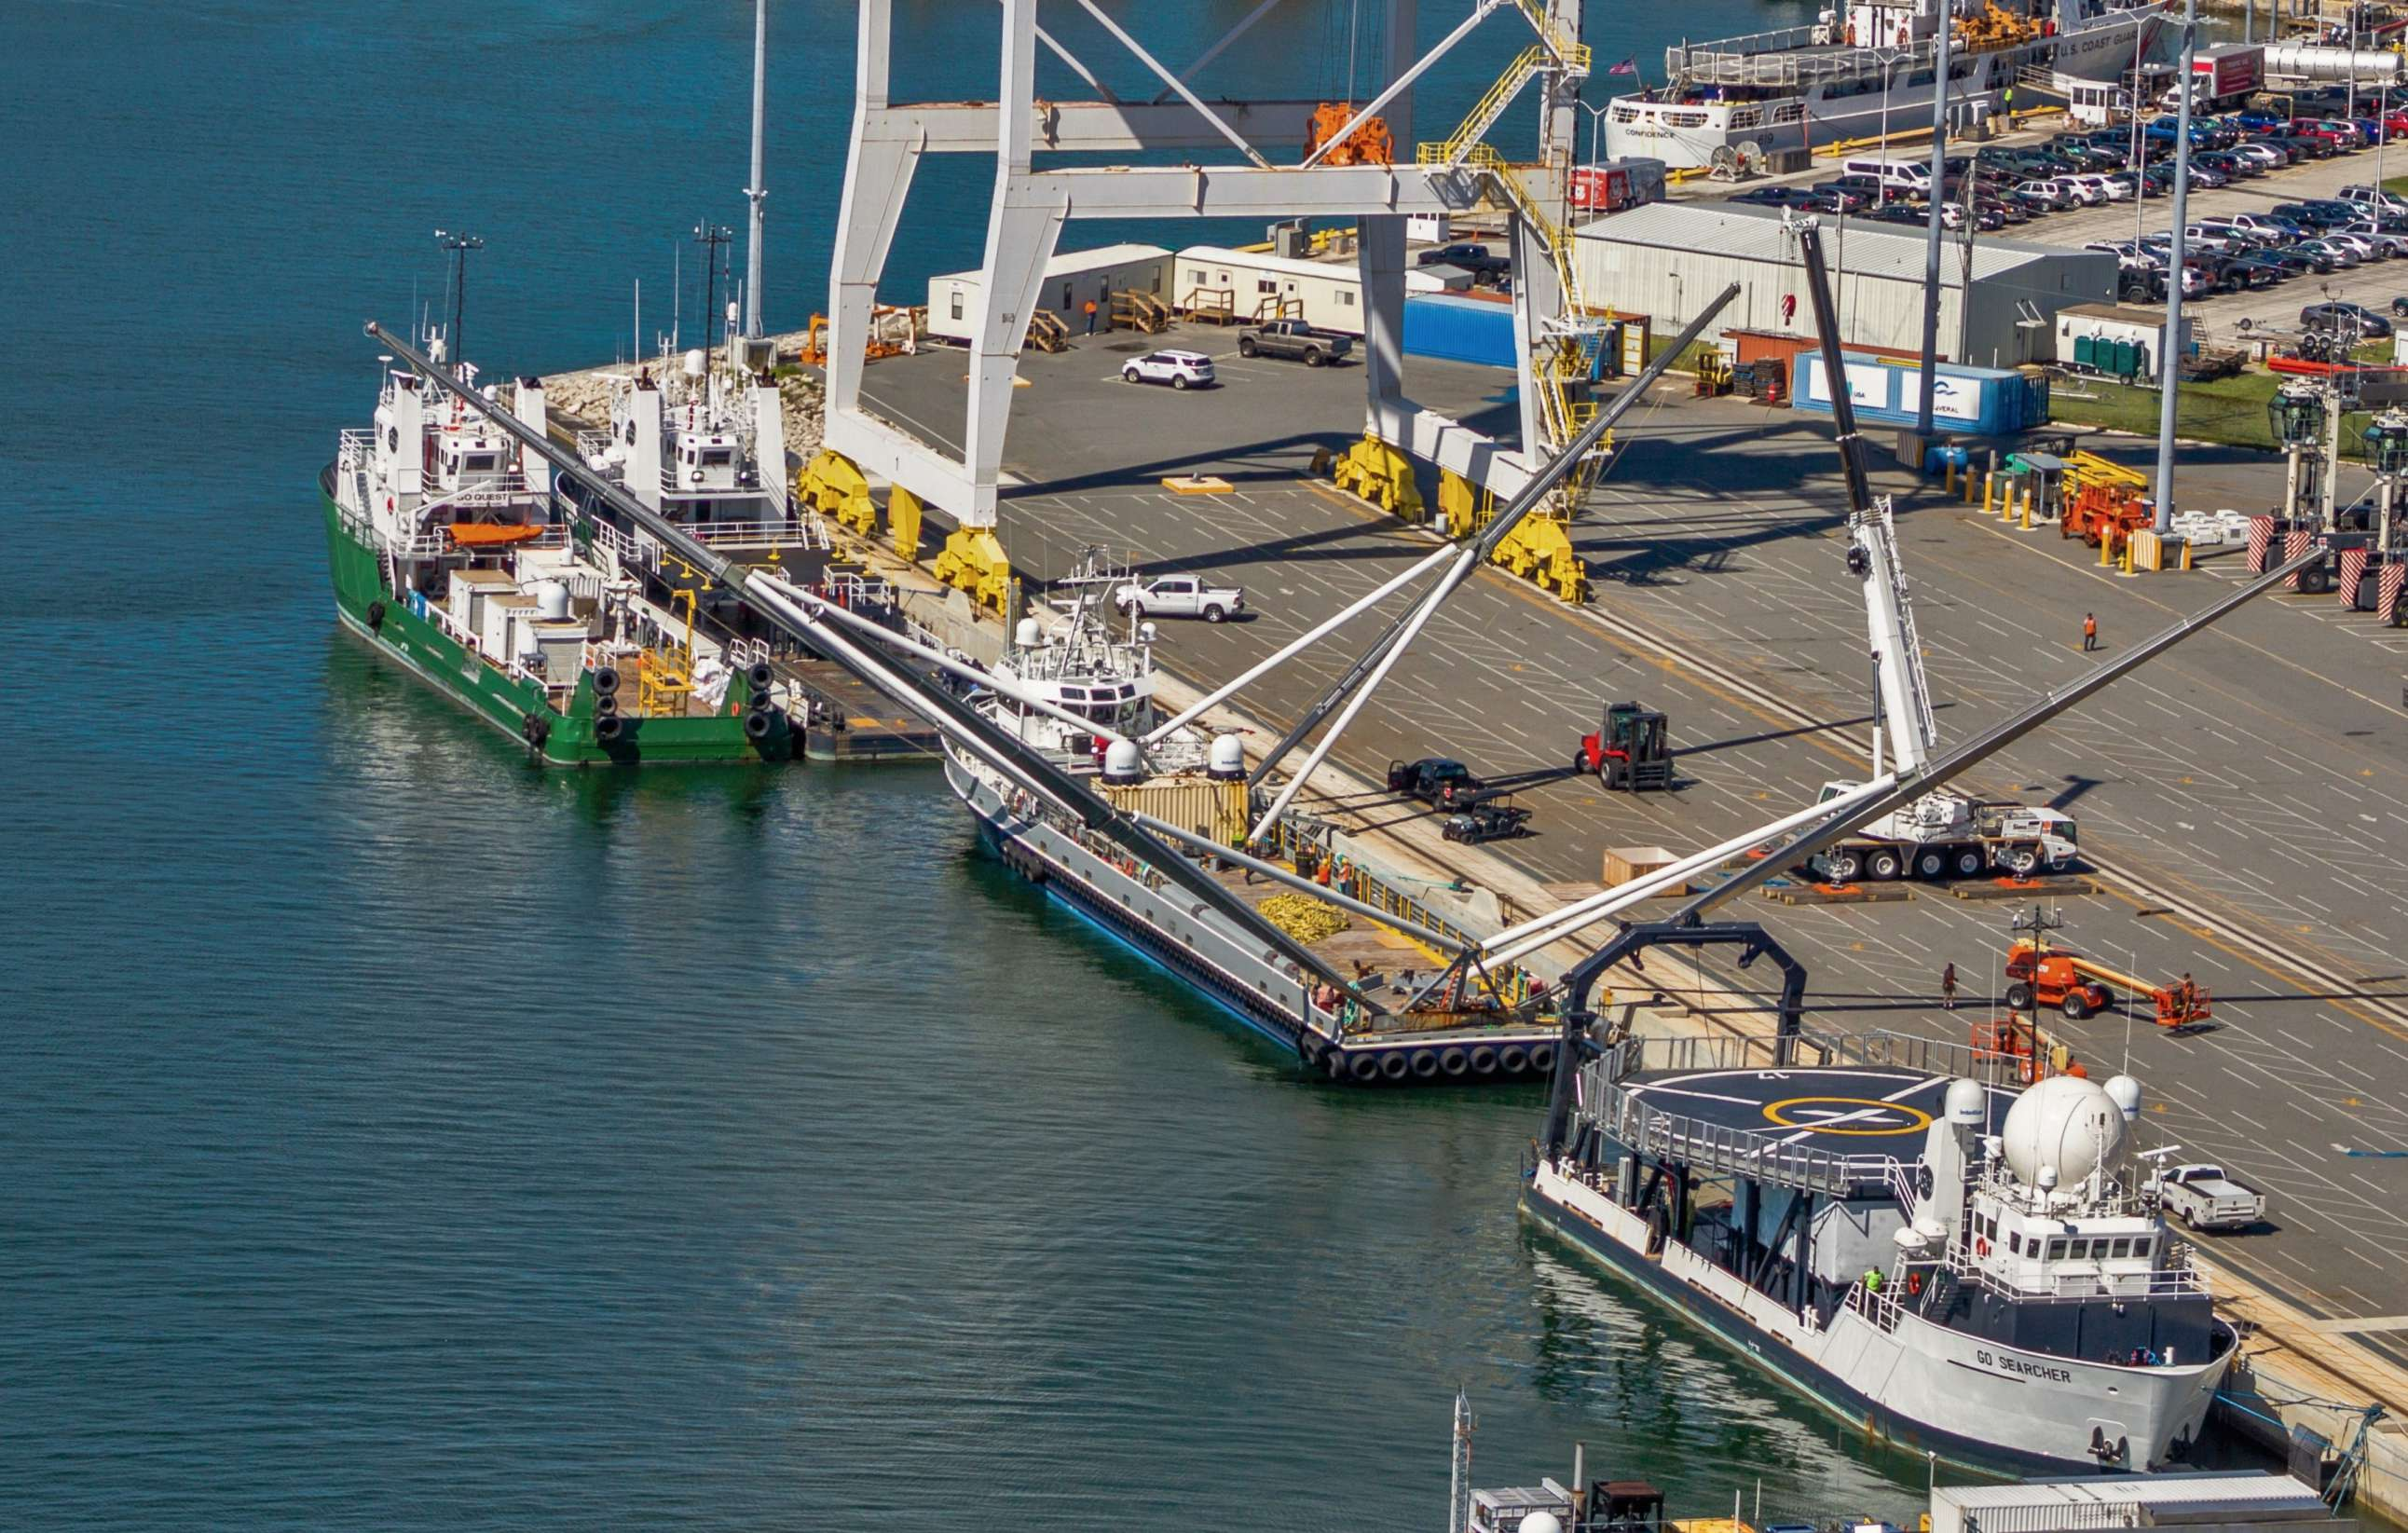 SpaceX East Coast fleet Mr Steven OCISLY Searcher 021419 (Tom Cross) 1 (c)